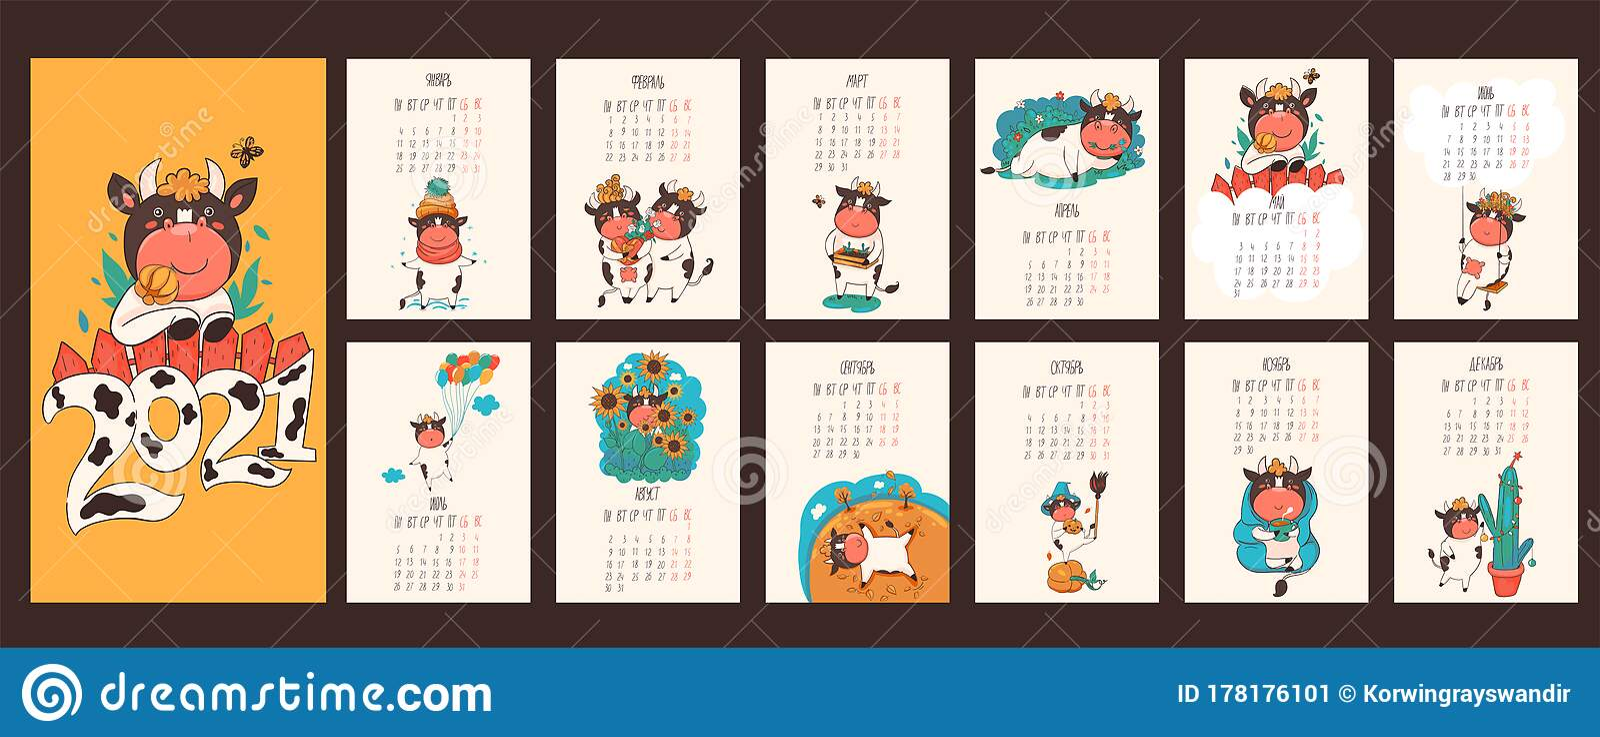 Russian Christmas Calendar 2021 Calendar 2021 Of The Ox In Russian Days Of The Week And Months In Russian Vector Graphics Stock Illustration Illustration Of Chinese Christmas 178176101